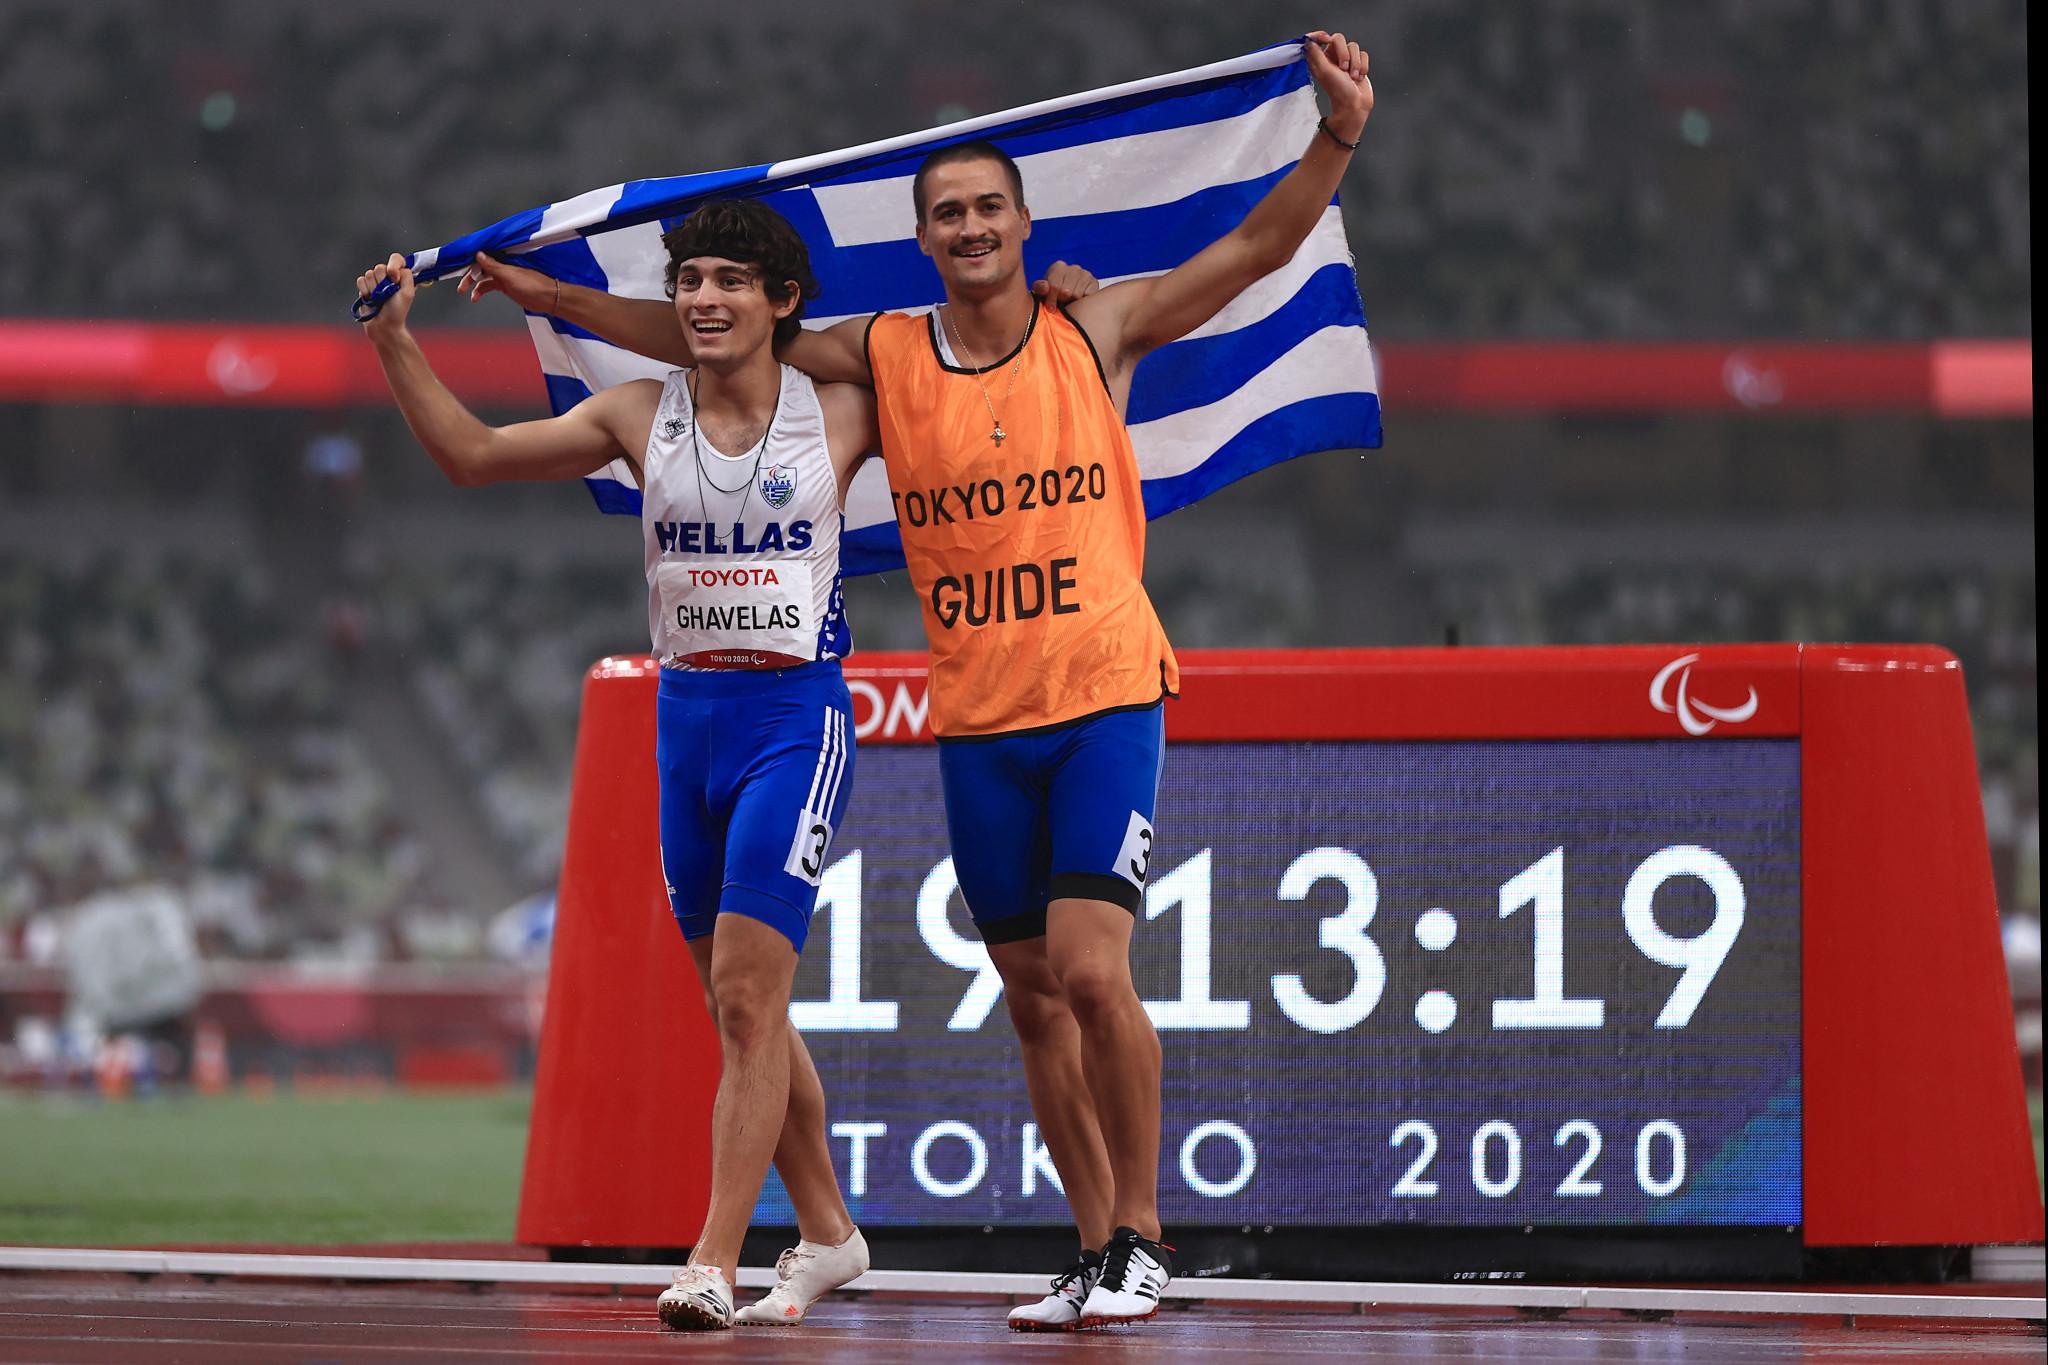 Greek President celebrates achievements of returning Paralympians at reception